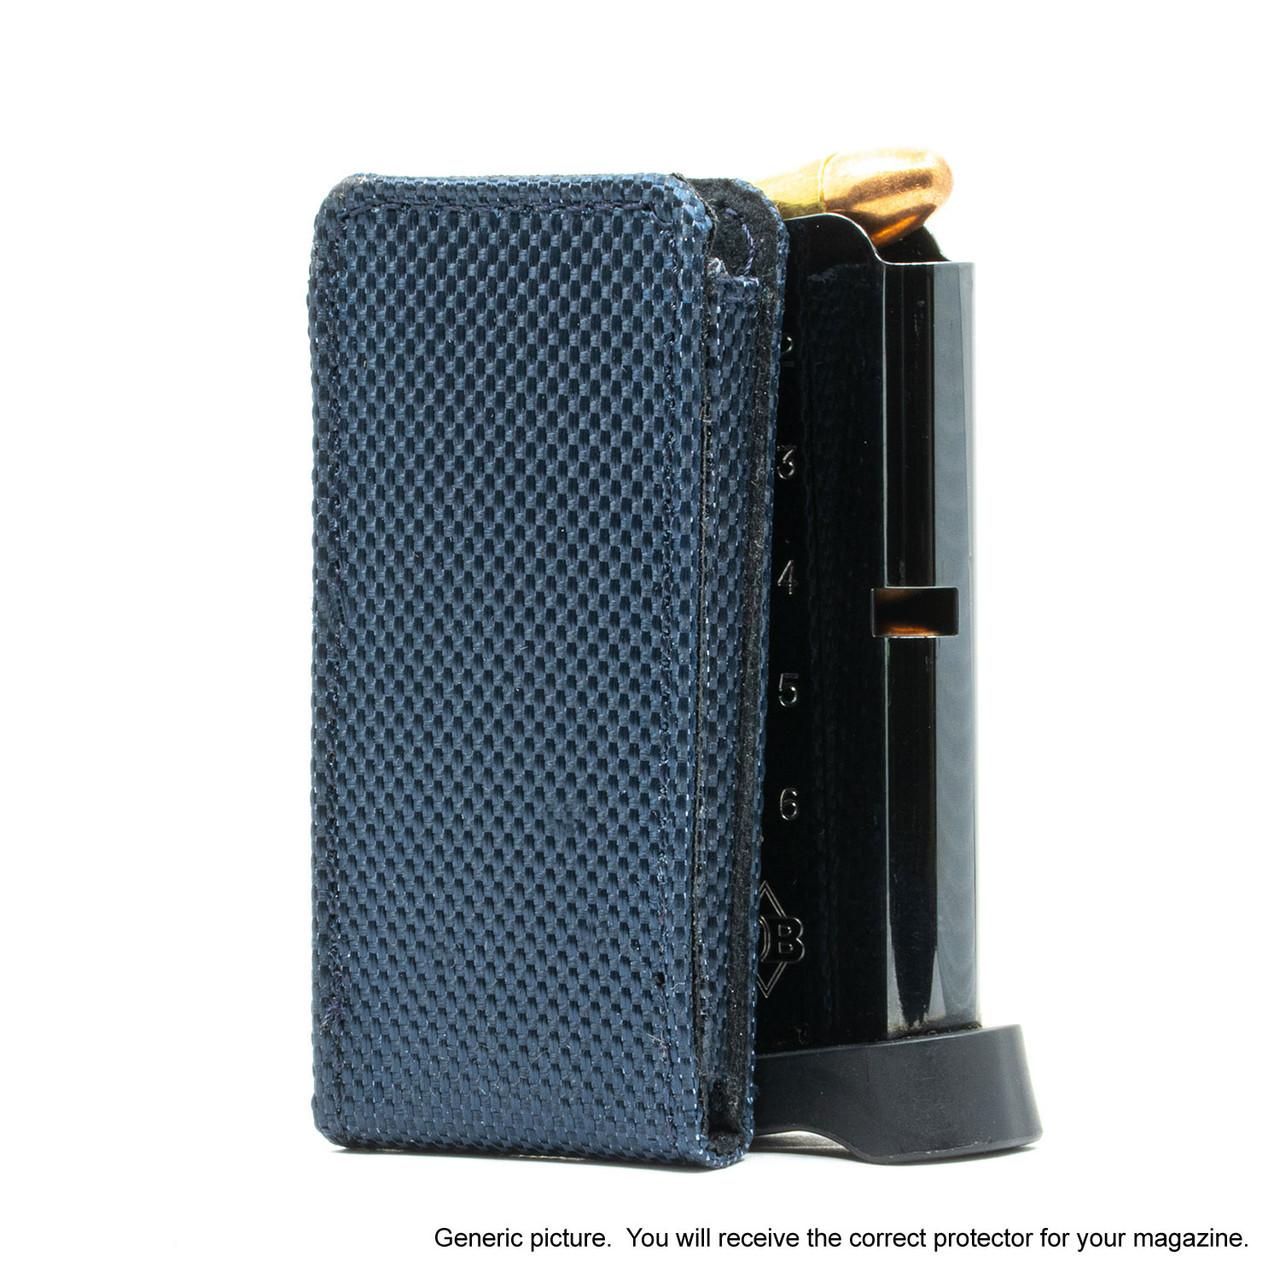 Glock 26 Blue Covert Magazine Pocket Protector